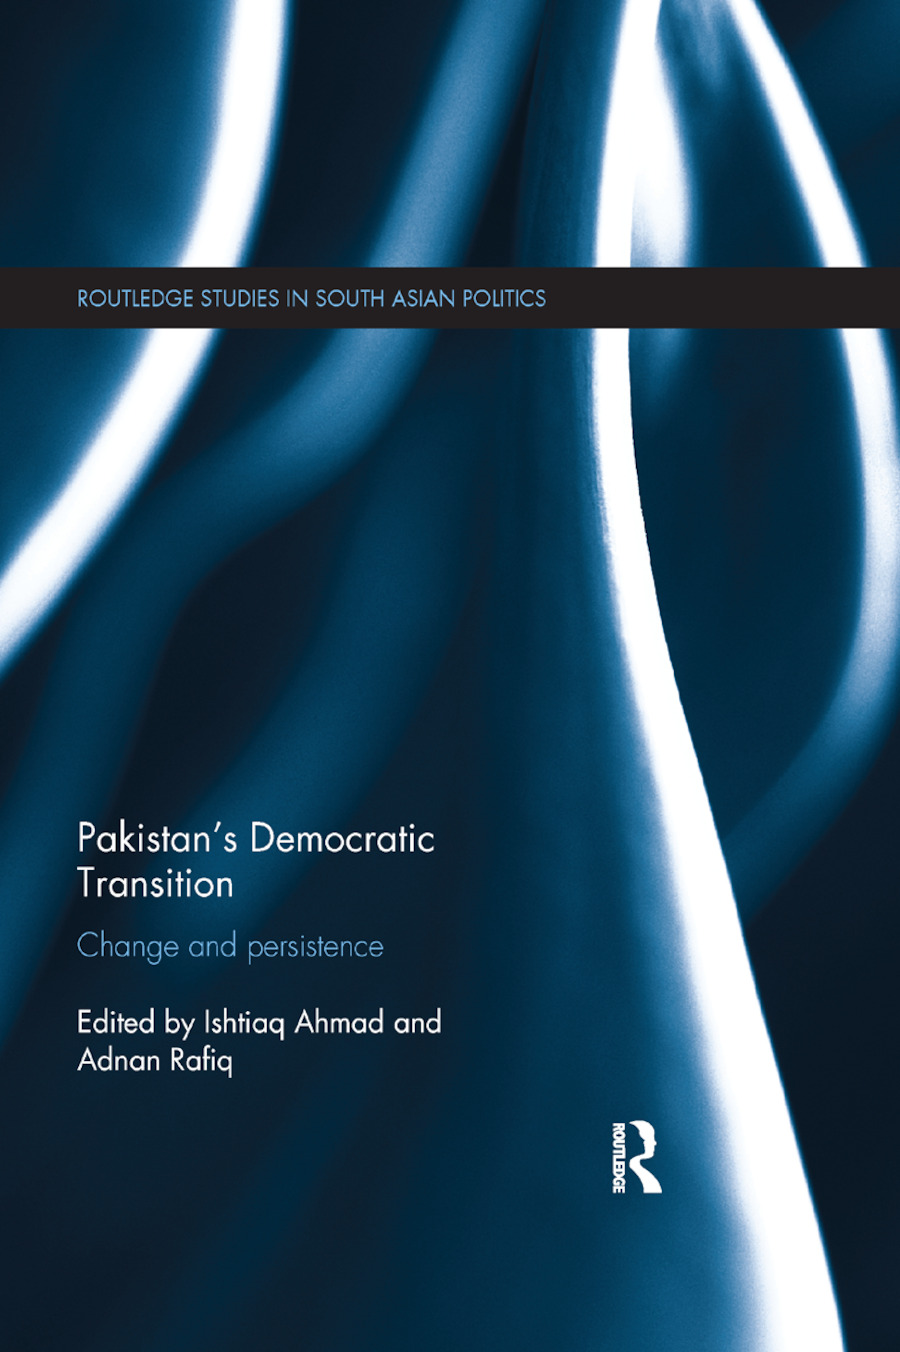 Pakistan's Democratic Transition